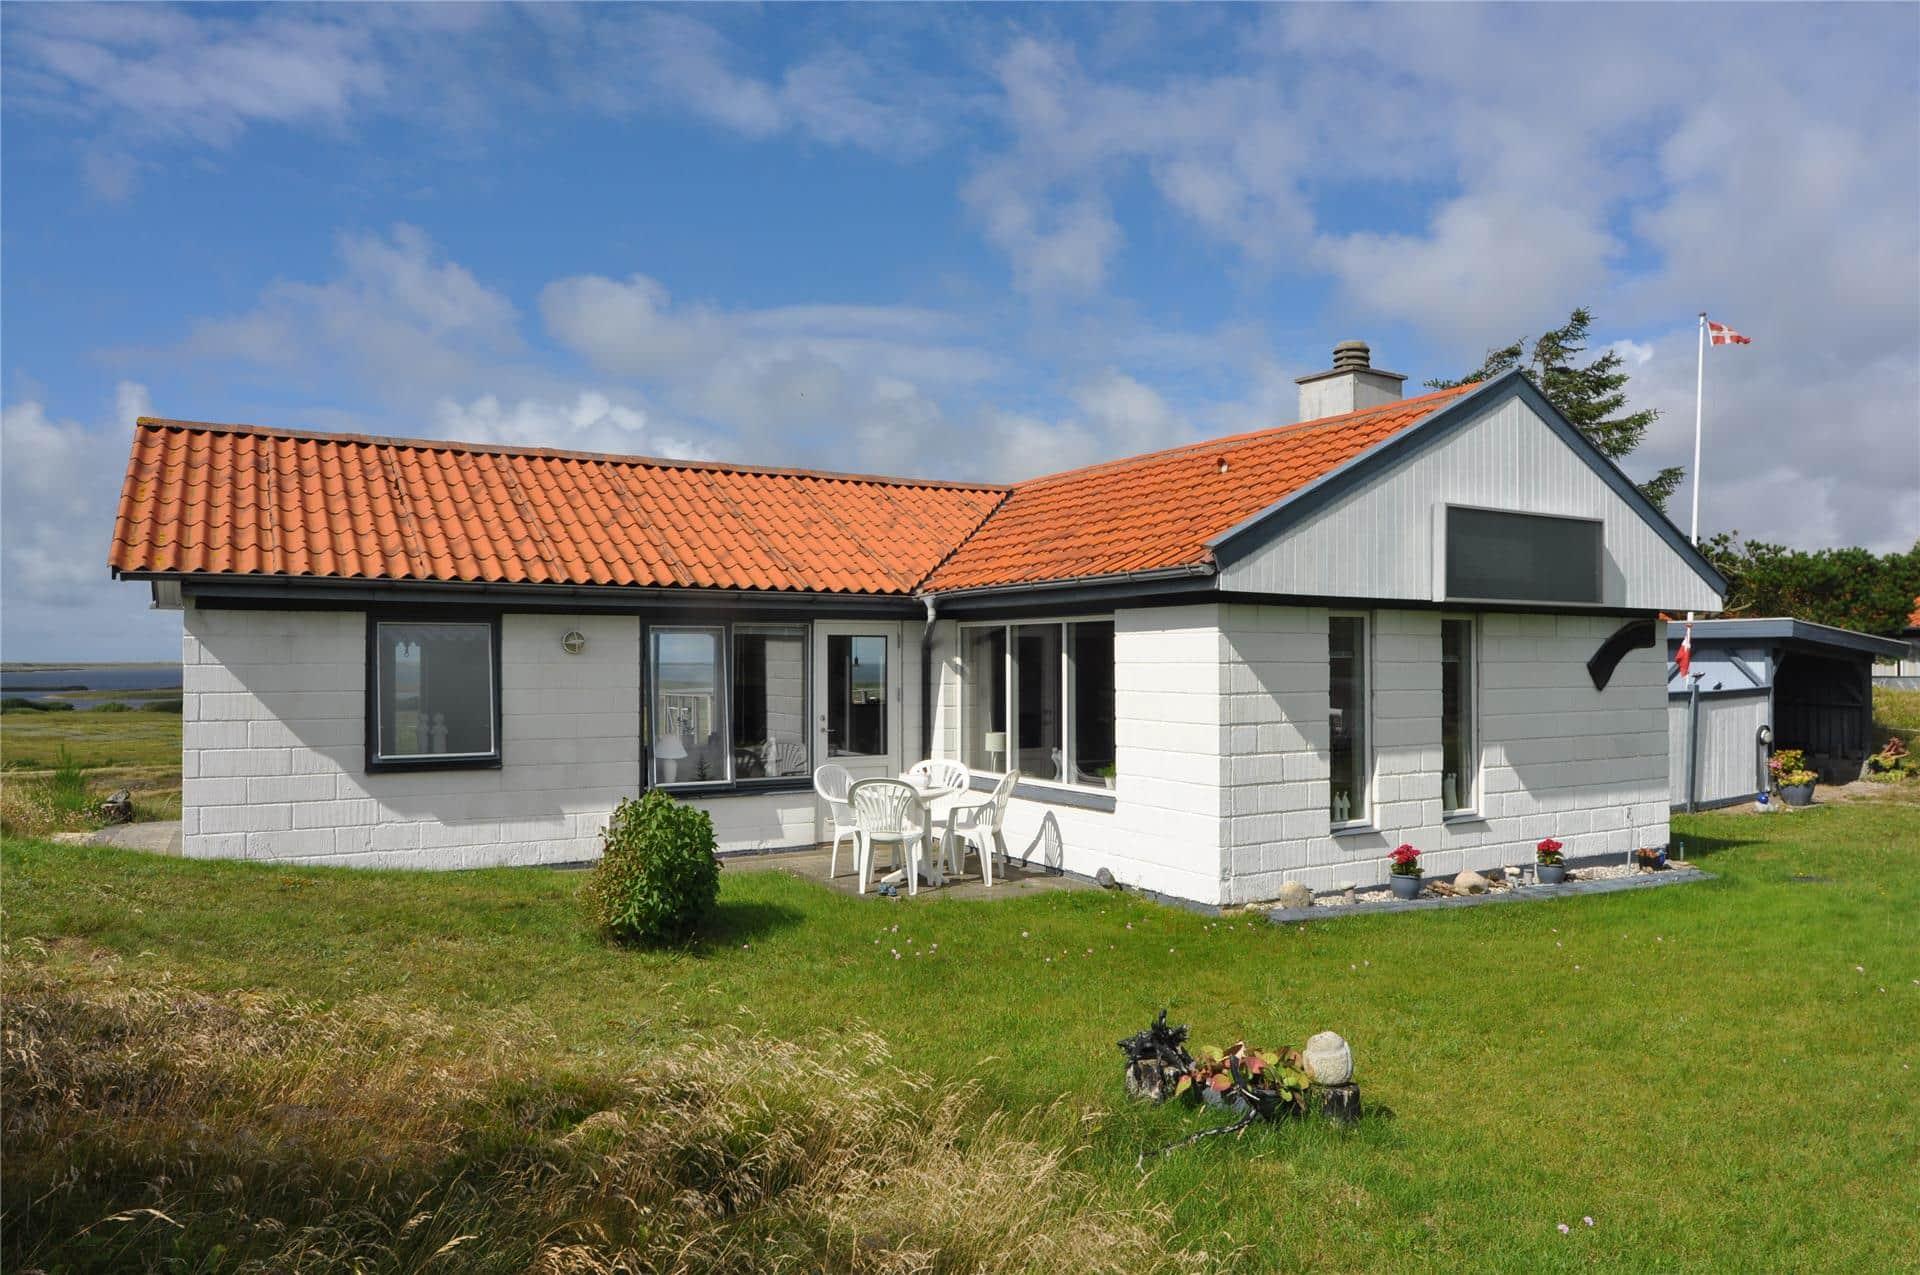 Afbeelding 1-175 Vakantiehuis 40407, Helmklit 362, DK - 6990 Ulfborg